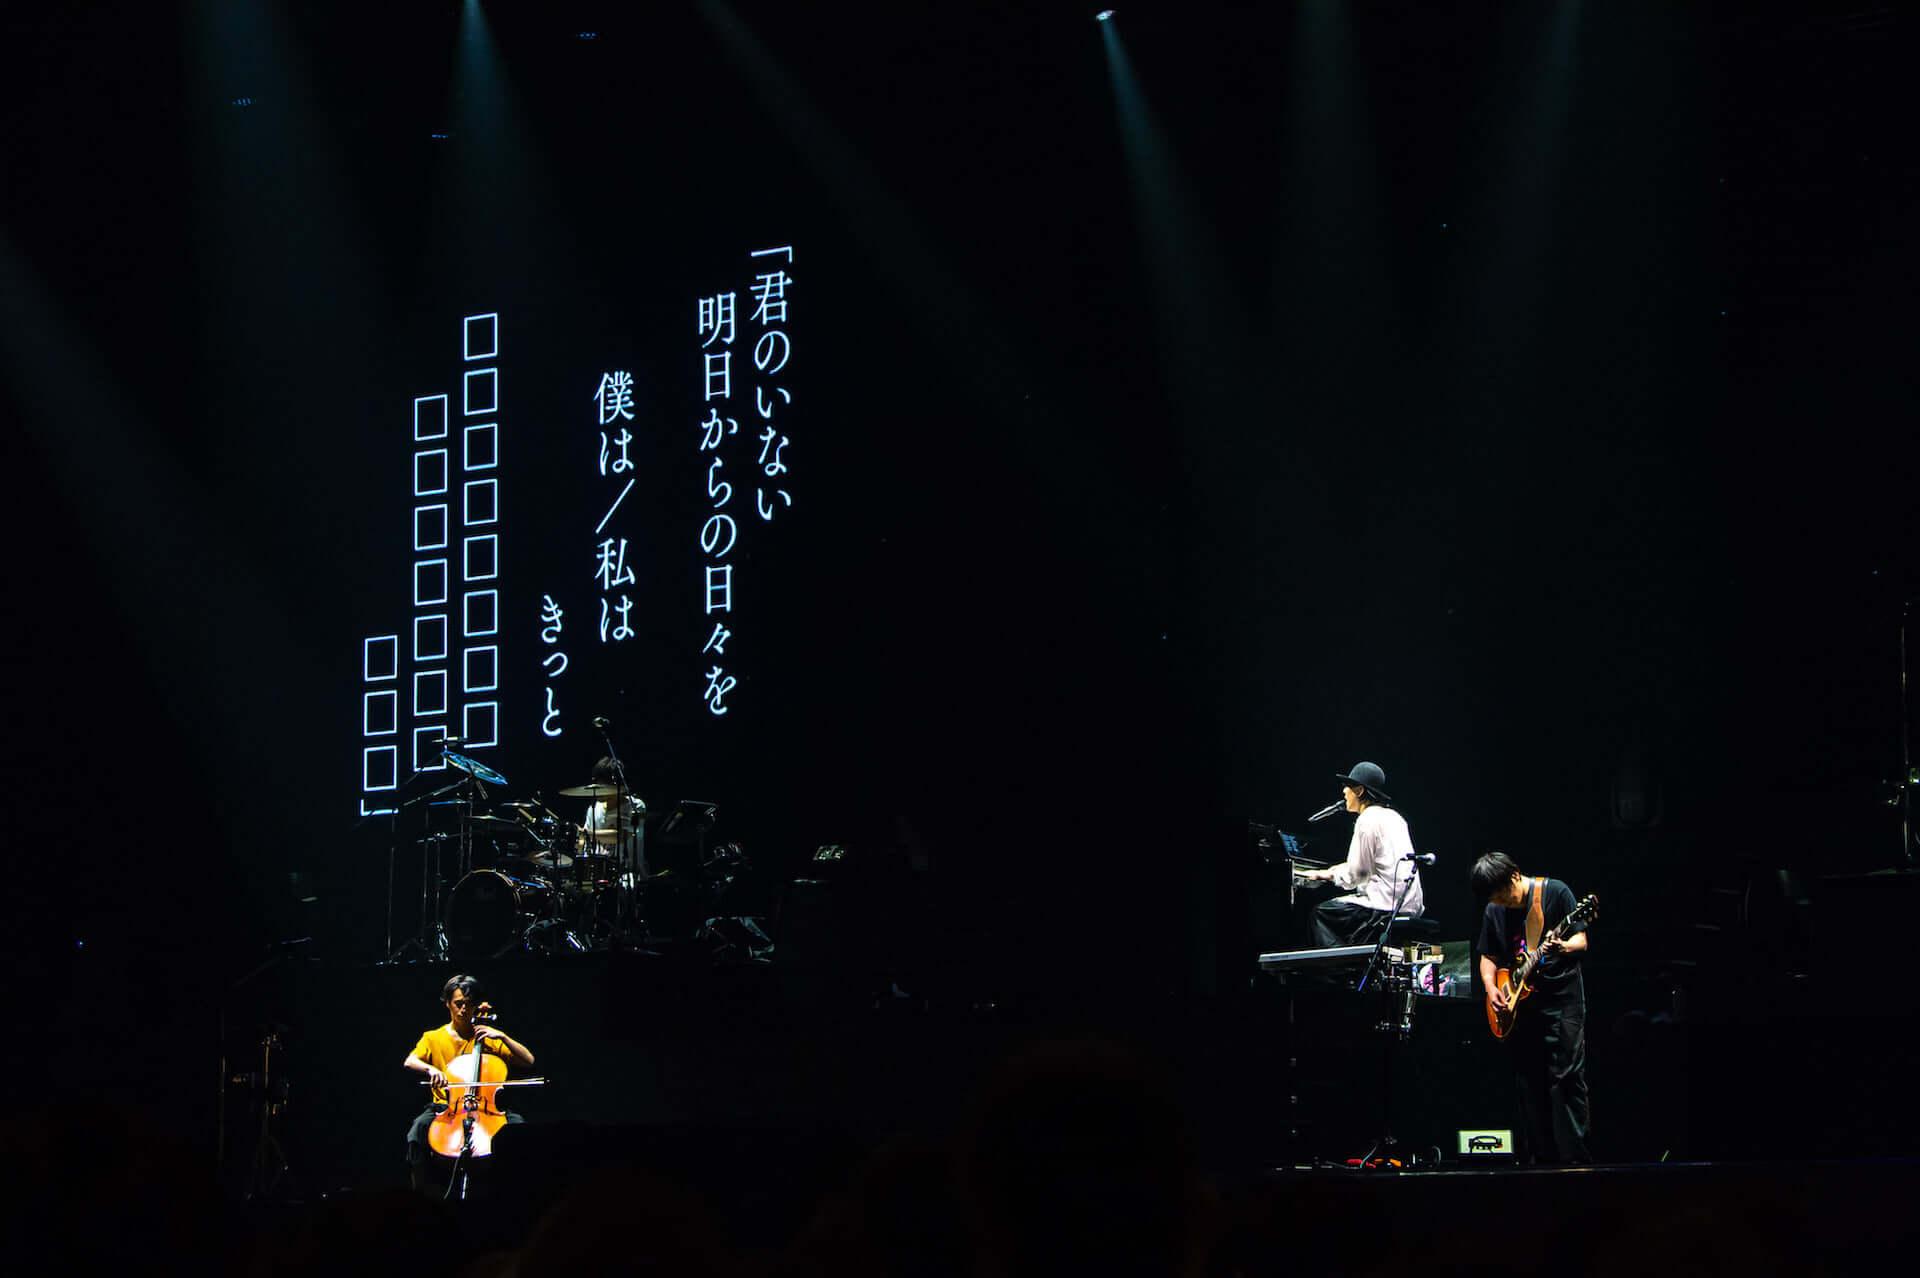 RADWIMPS横浜アリーナ公演のライブ写真が公開!<ANTI ANTI GENERATION TOUR 2019>レポート music190830_radwimps_live_7-1920x1278